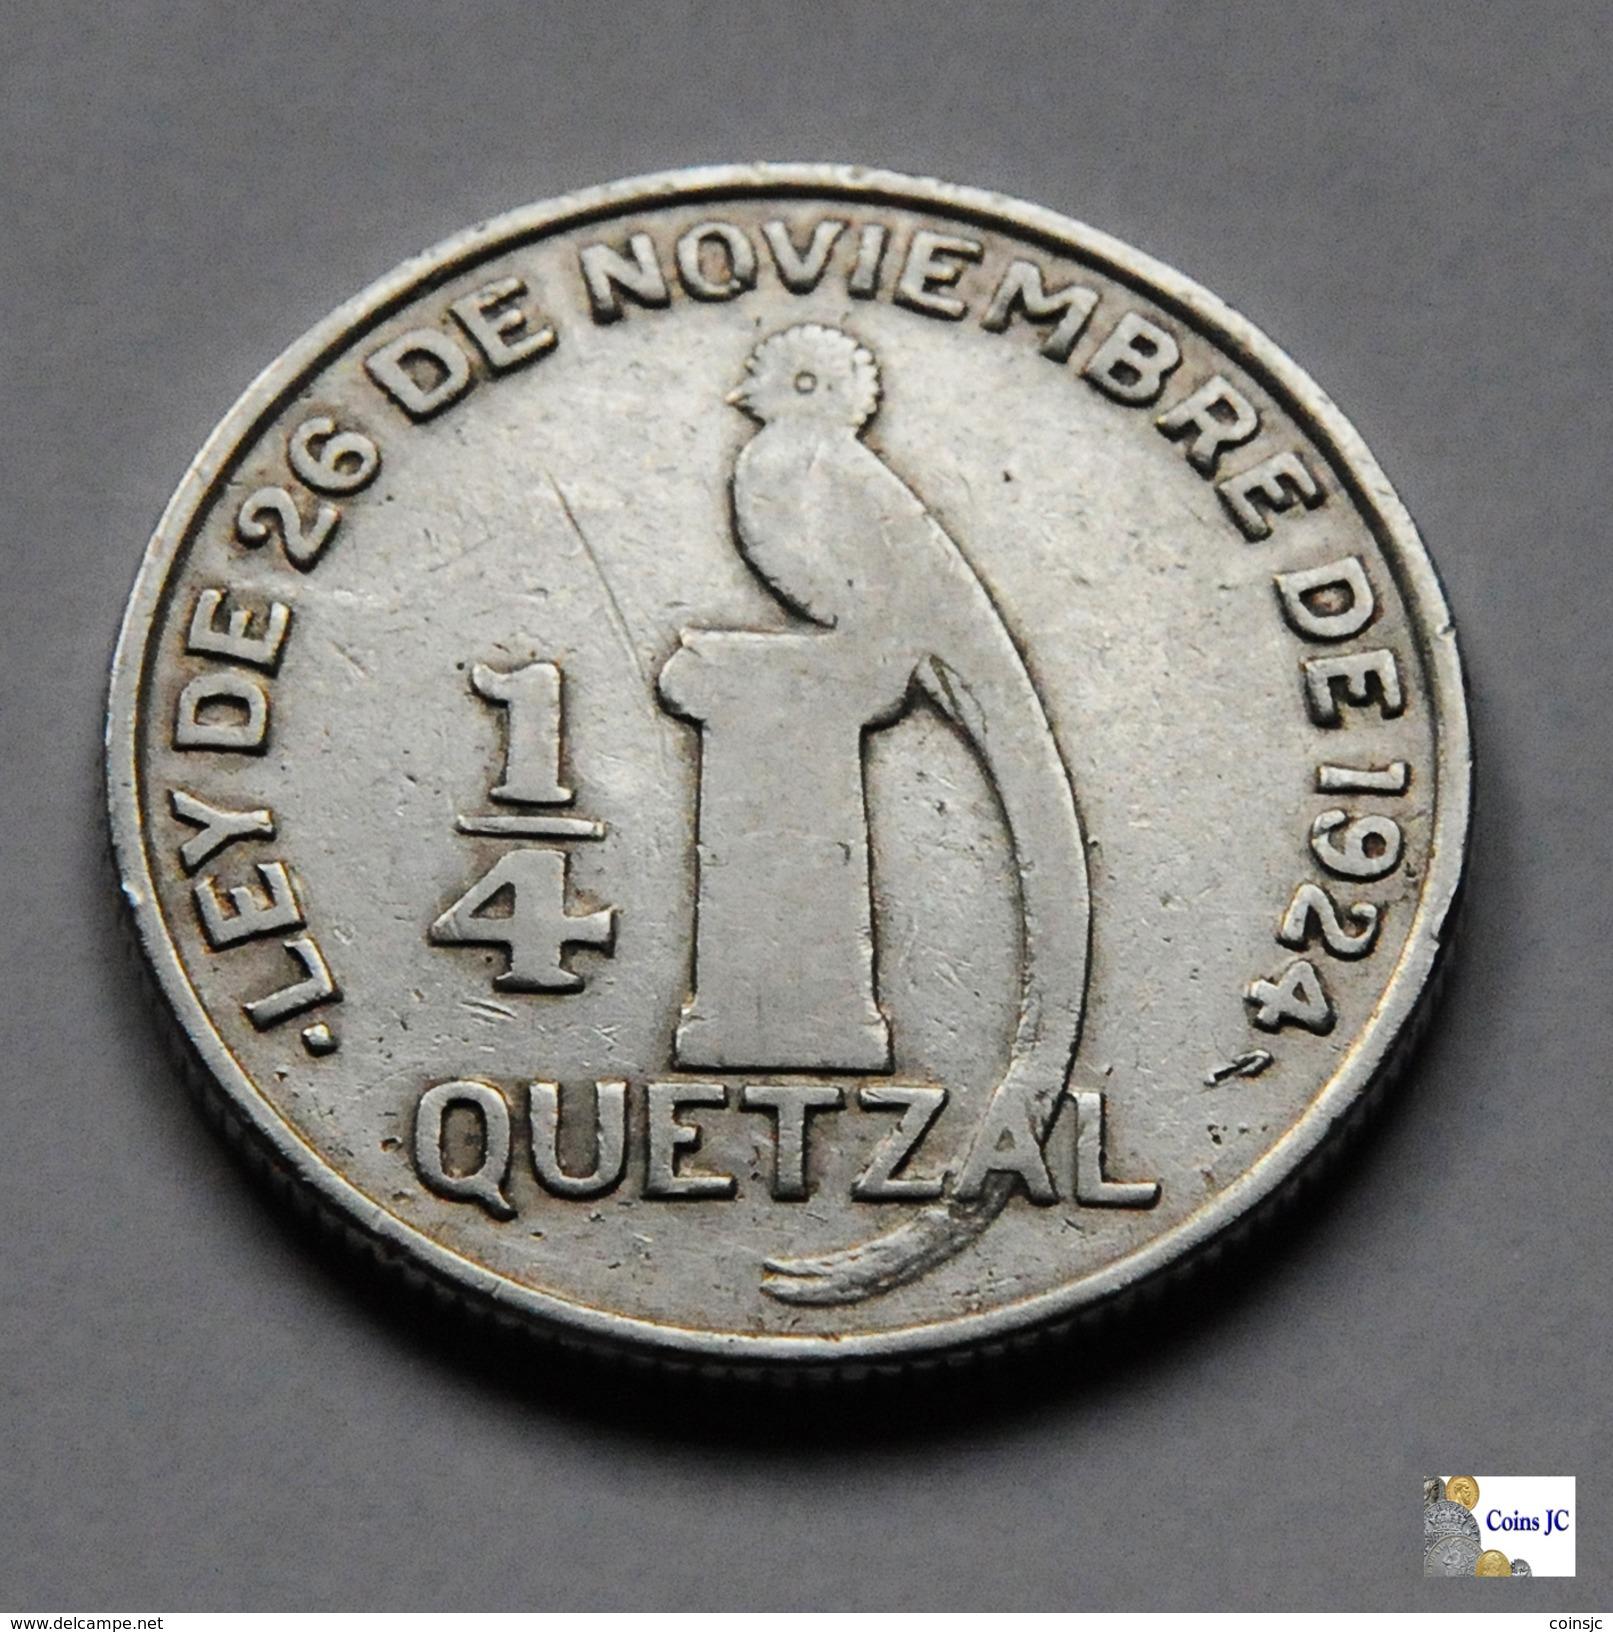 Guatemala - 1/4 Quetzal - 1948 - Guatemala